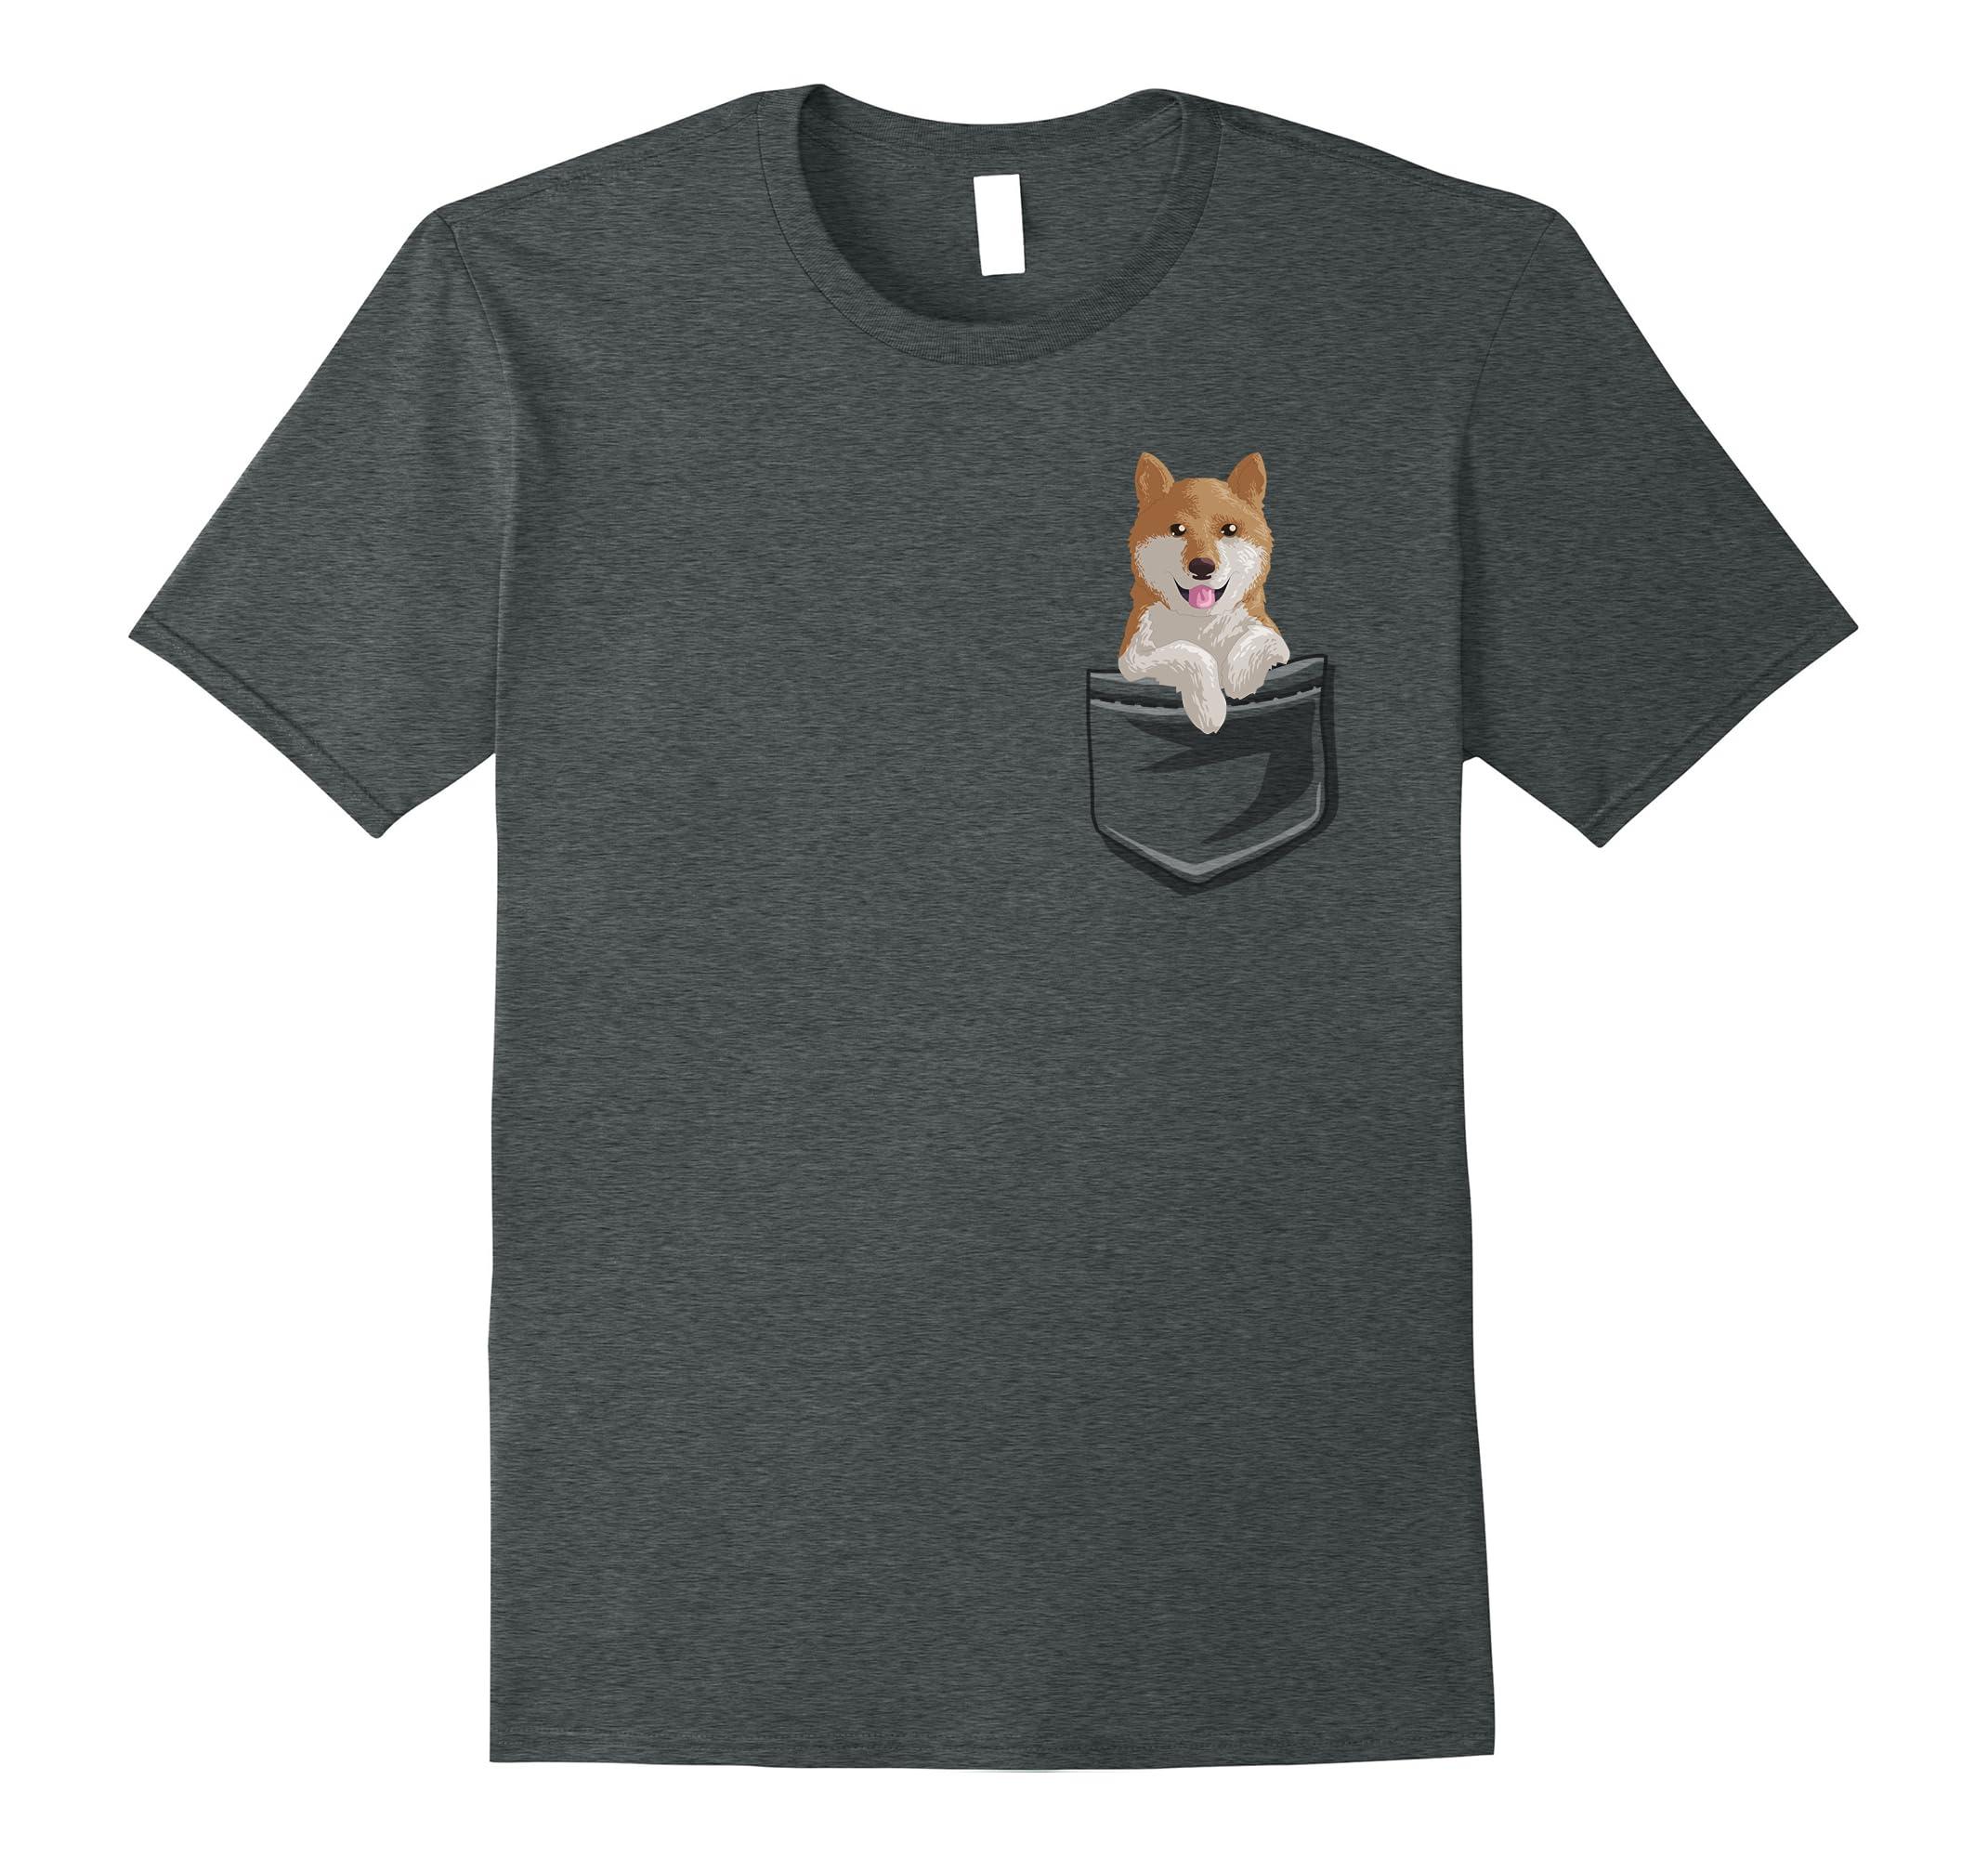 Shiba Pocket T Shirt Puppy Shirt-Tovacu